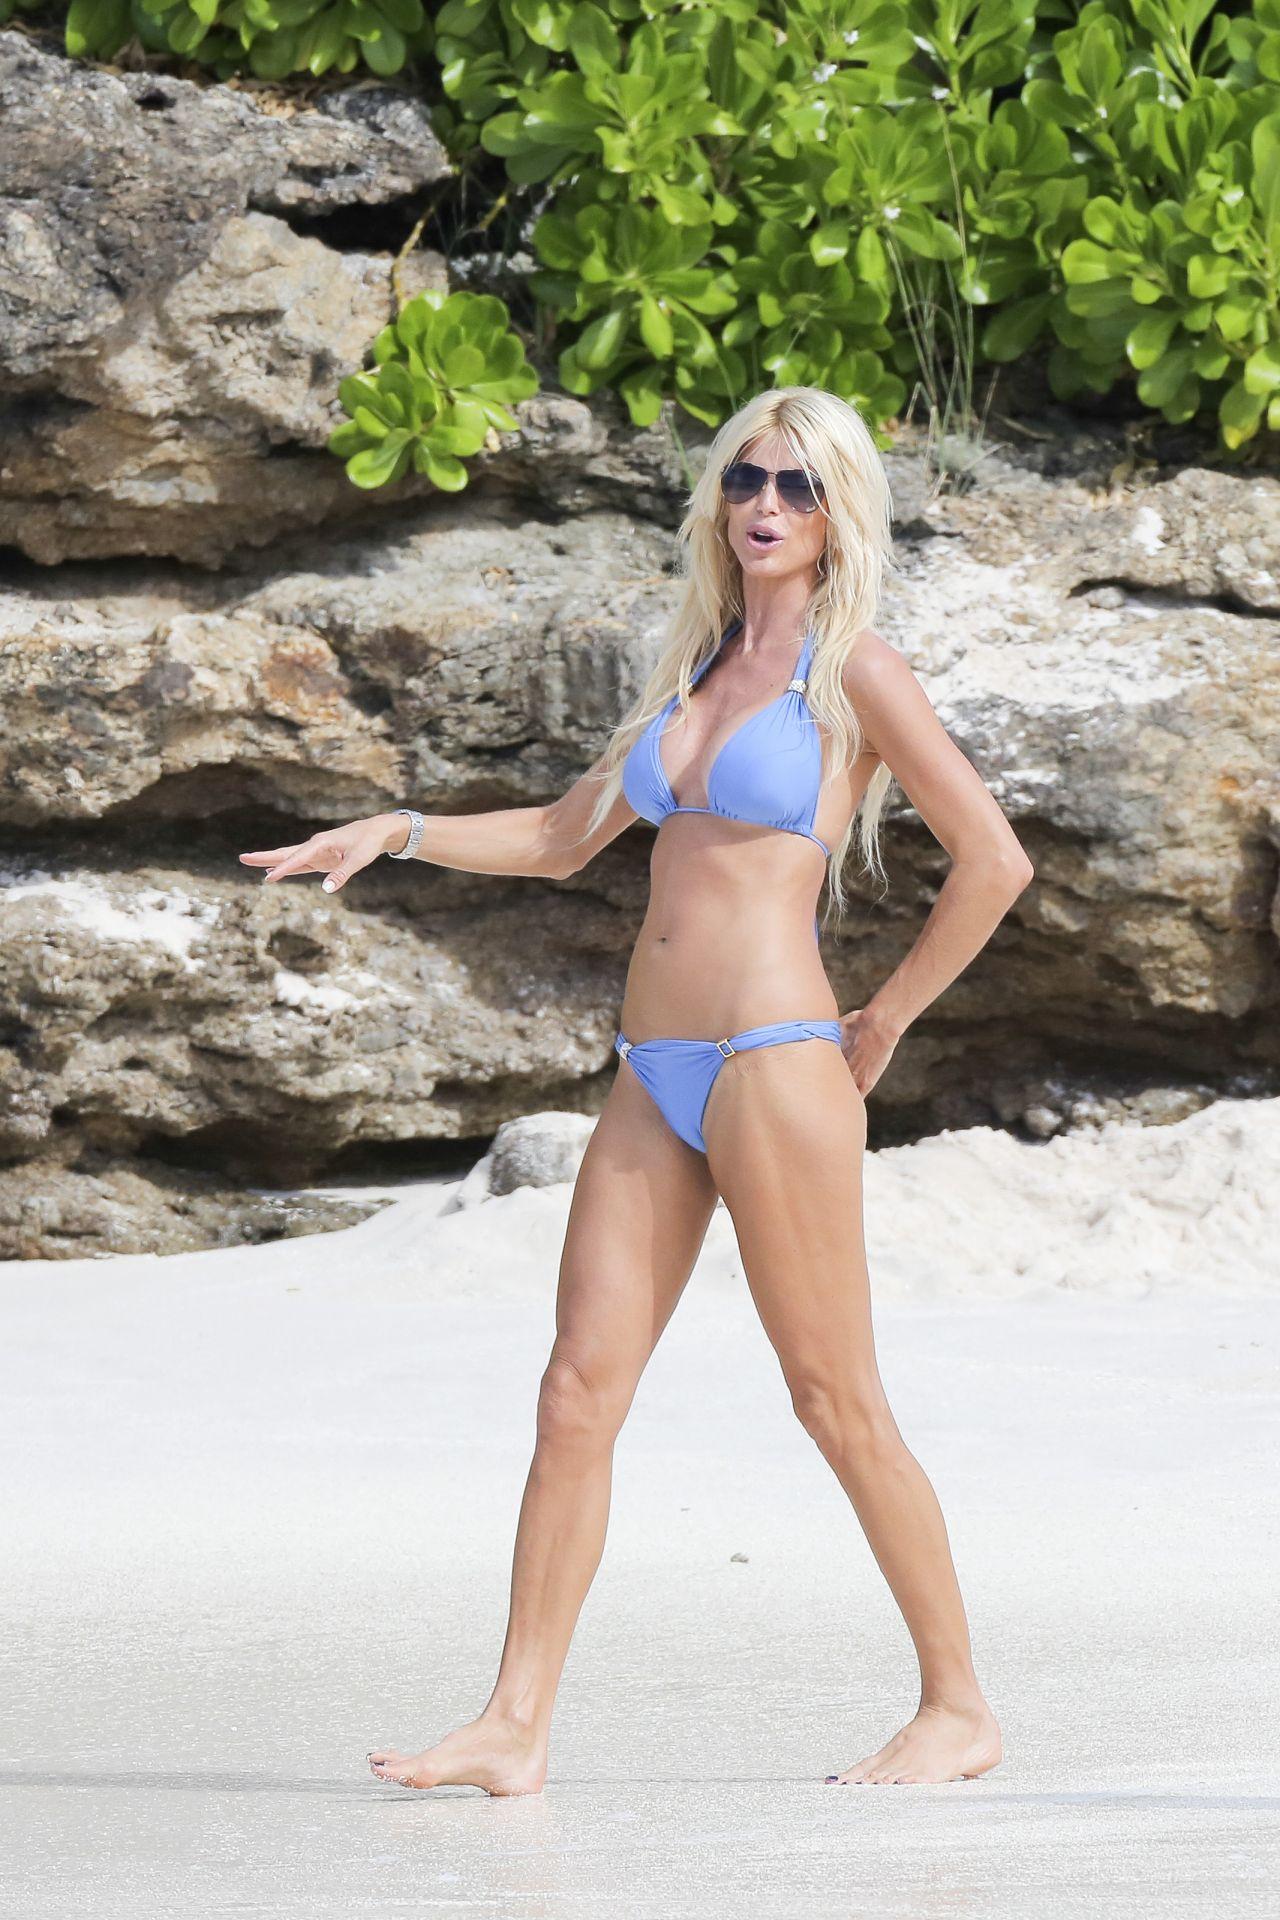 Victoria Silvstedt Bikini Candids - St. Barts, January 2014